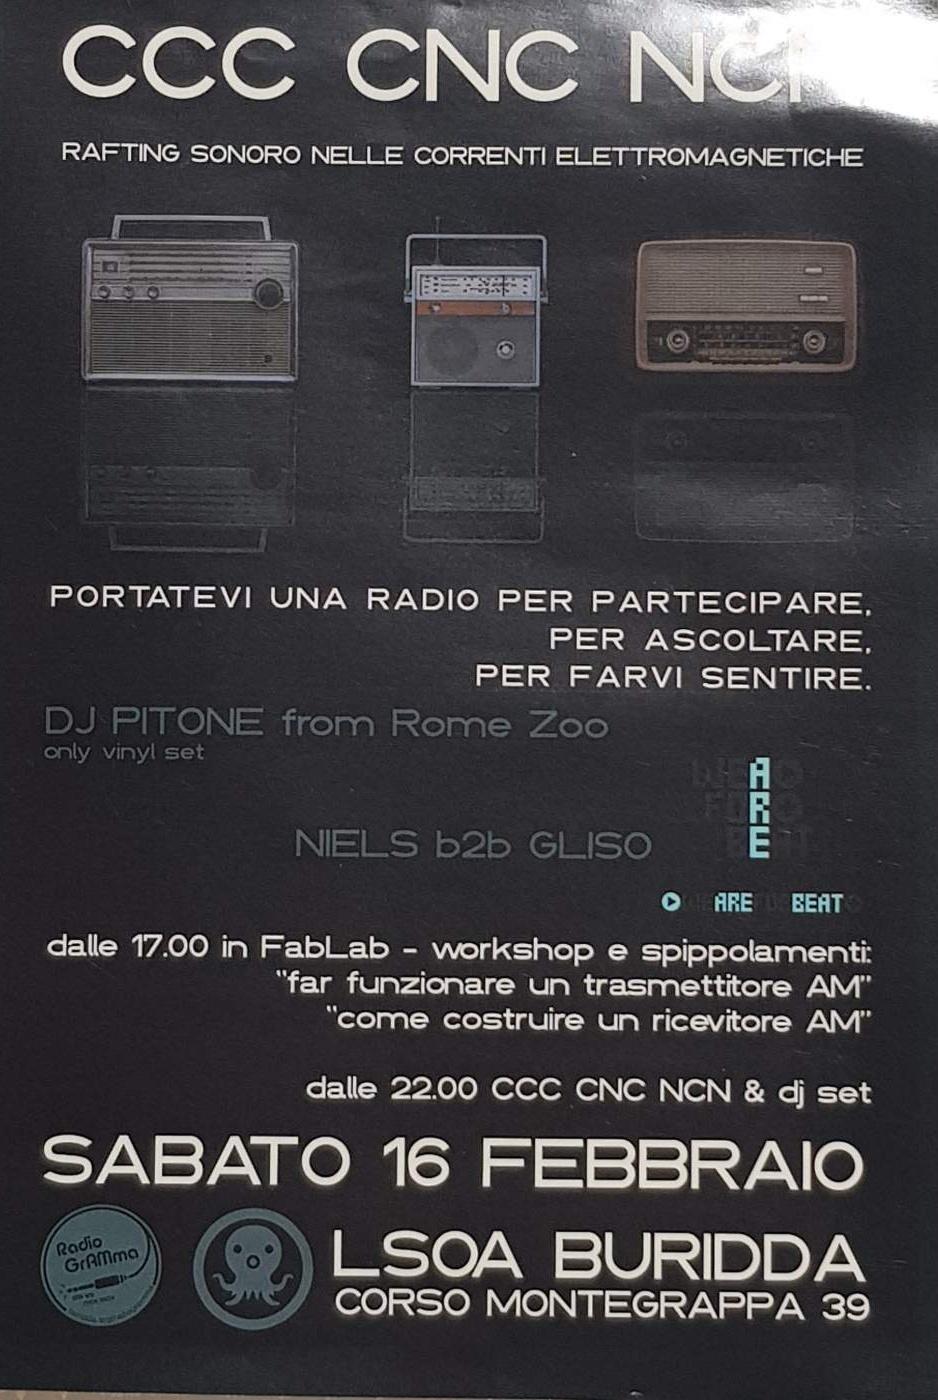 CCC CNC NCN LSOA Buridda Corso Monte Grappa 39, 16137 Genova Dal 16/02/2019 Al 16/02/2019 22:00 - 02:00